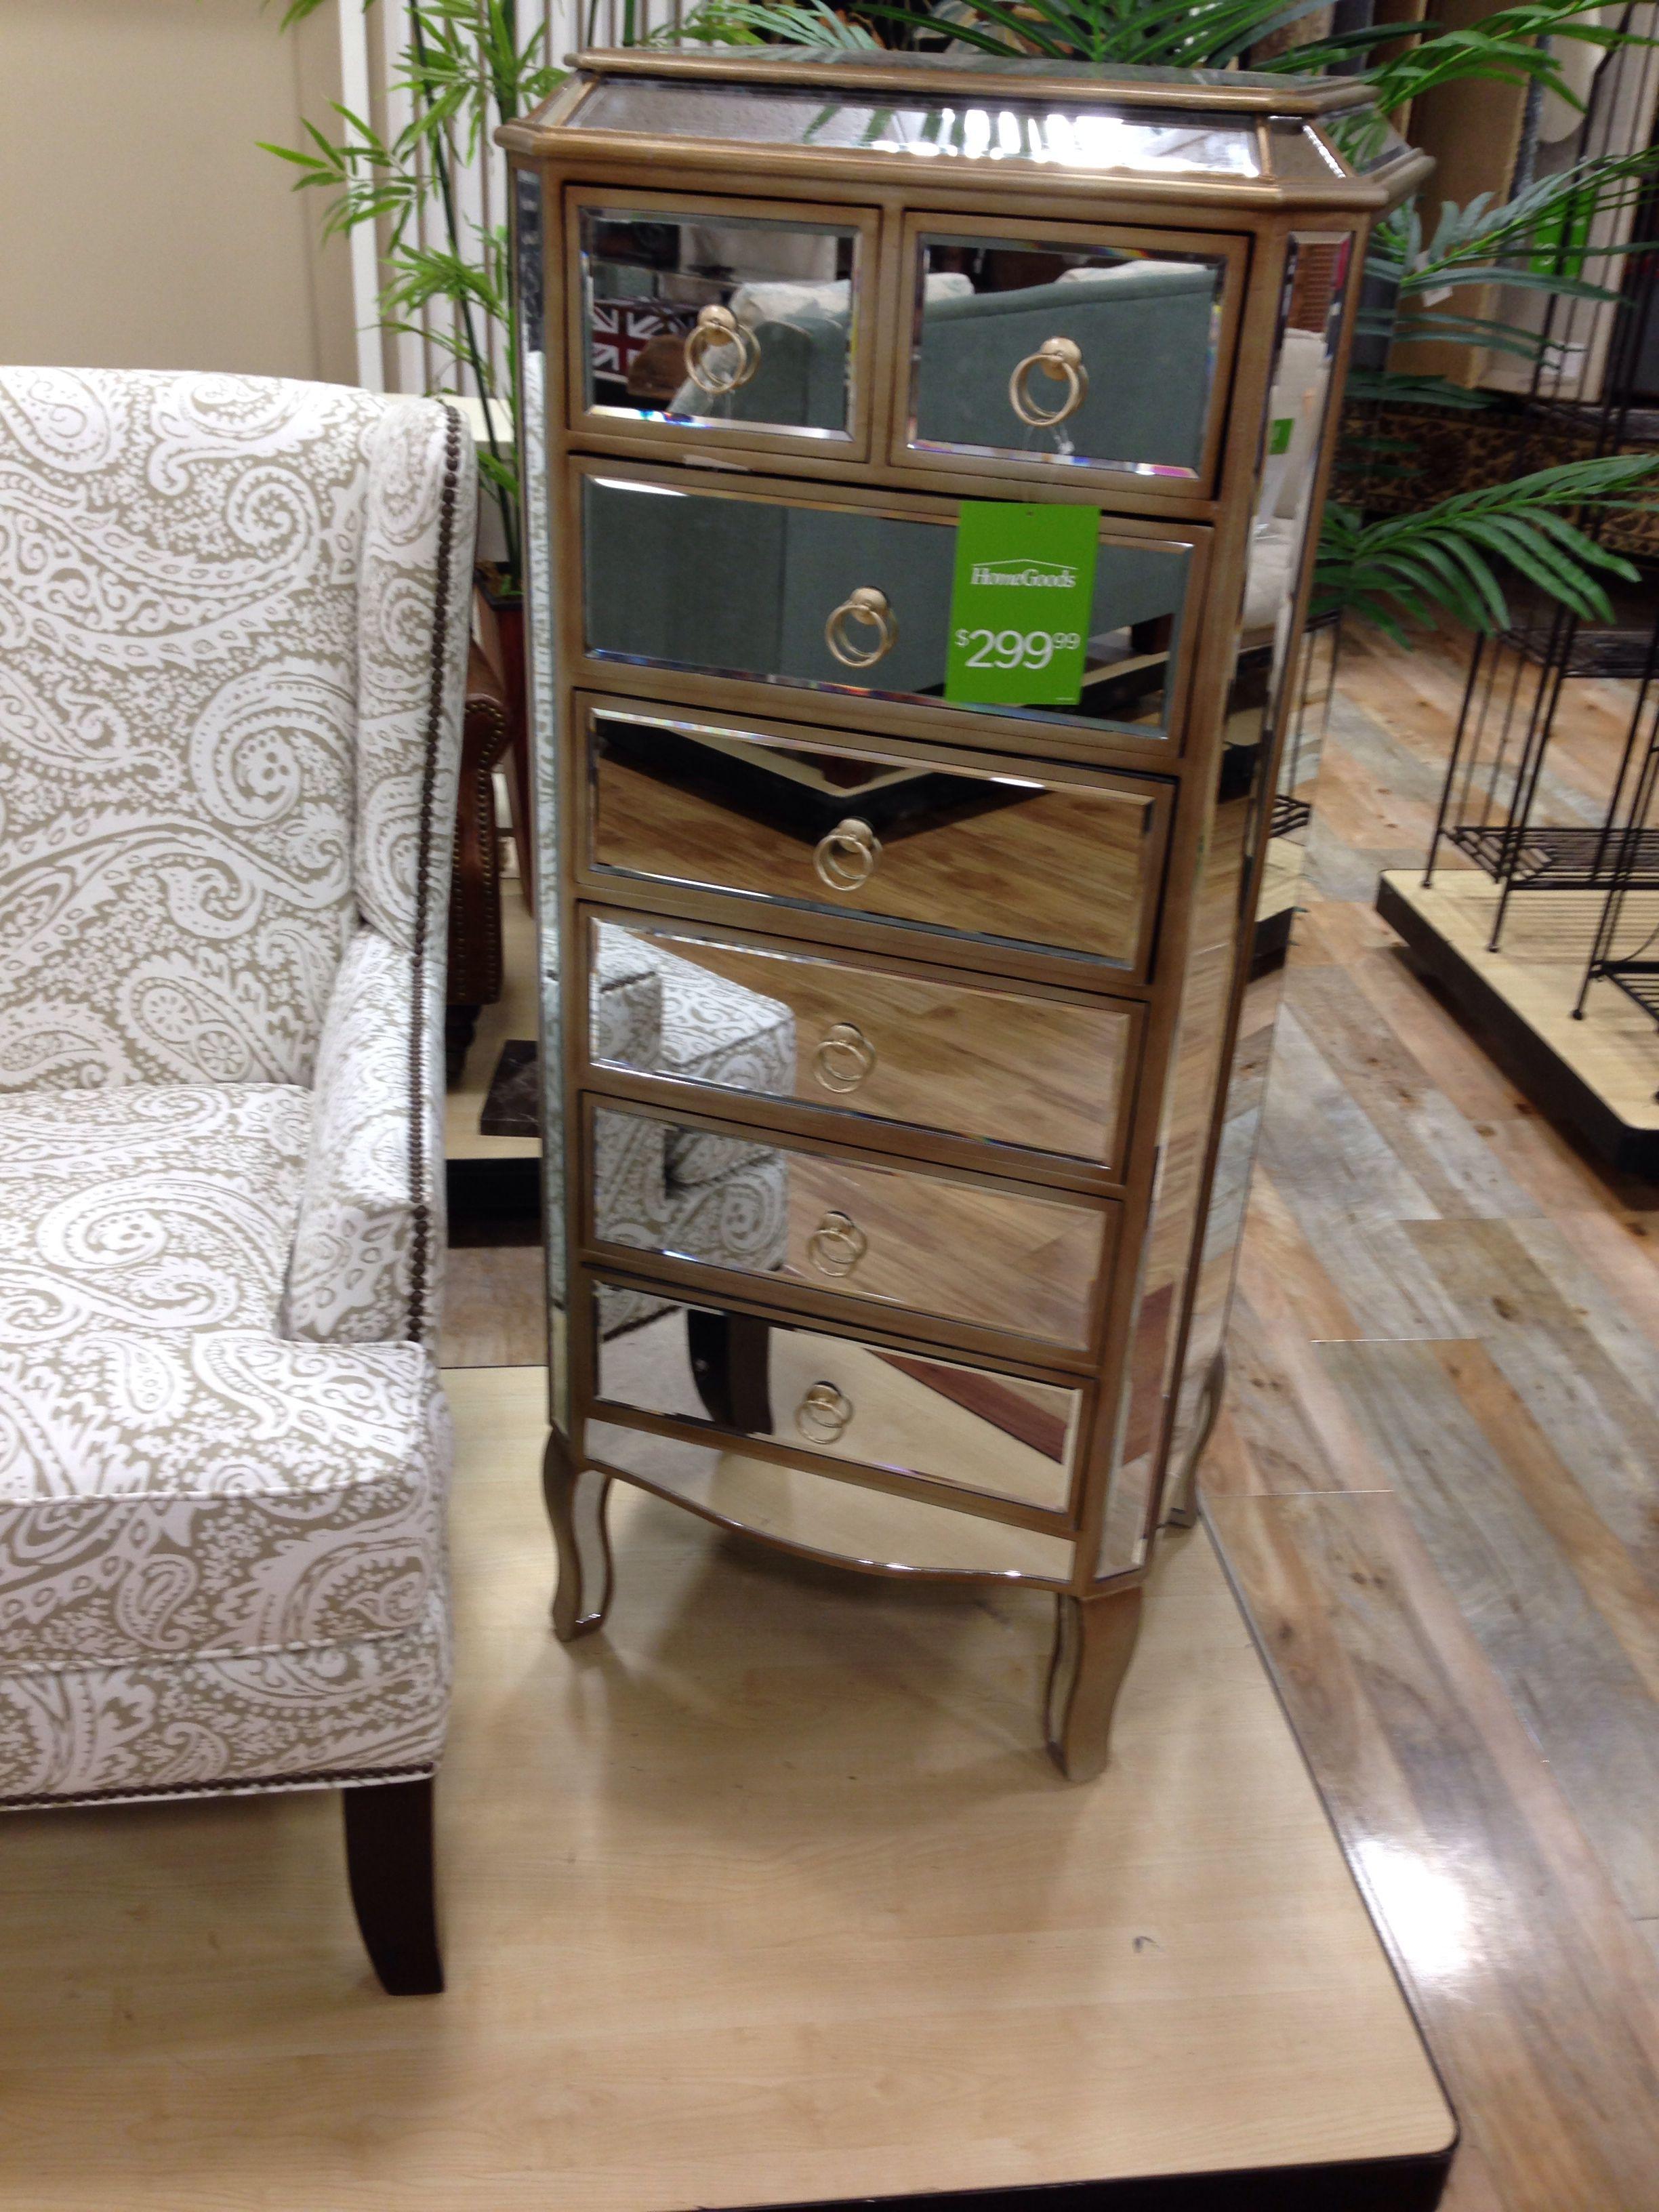 Mirrored dresser · Home Goods FurnitureMirrored ...